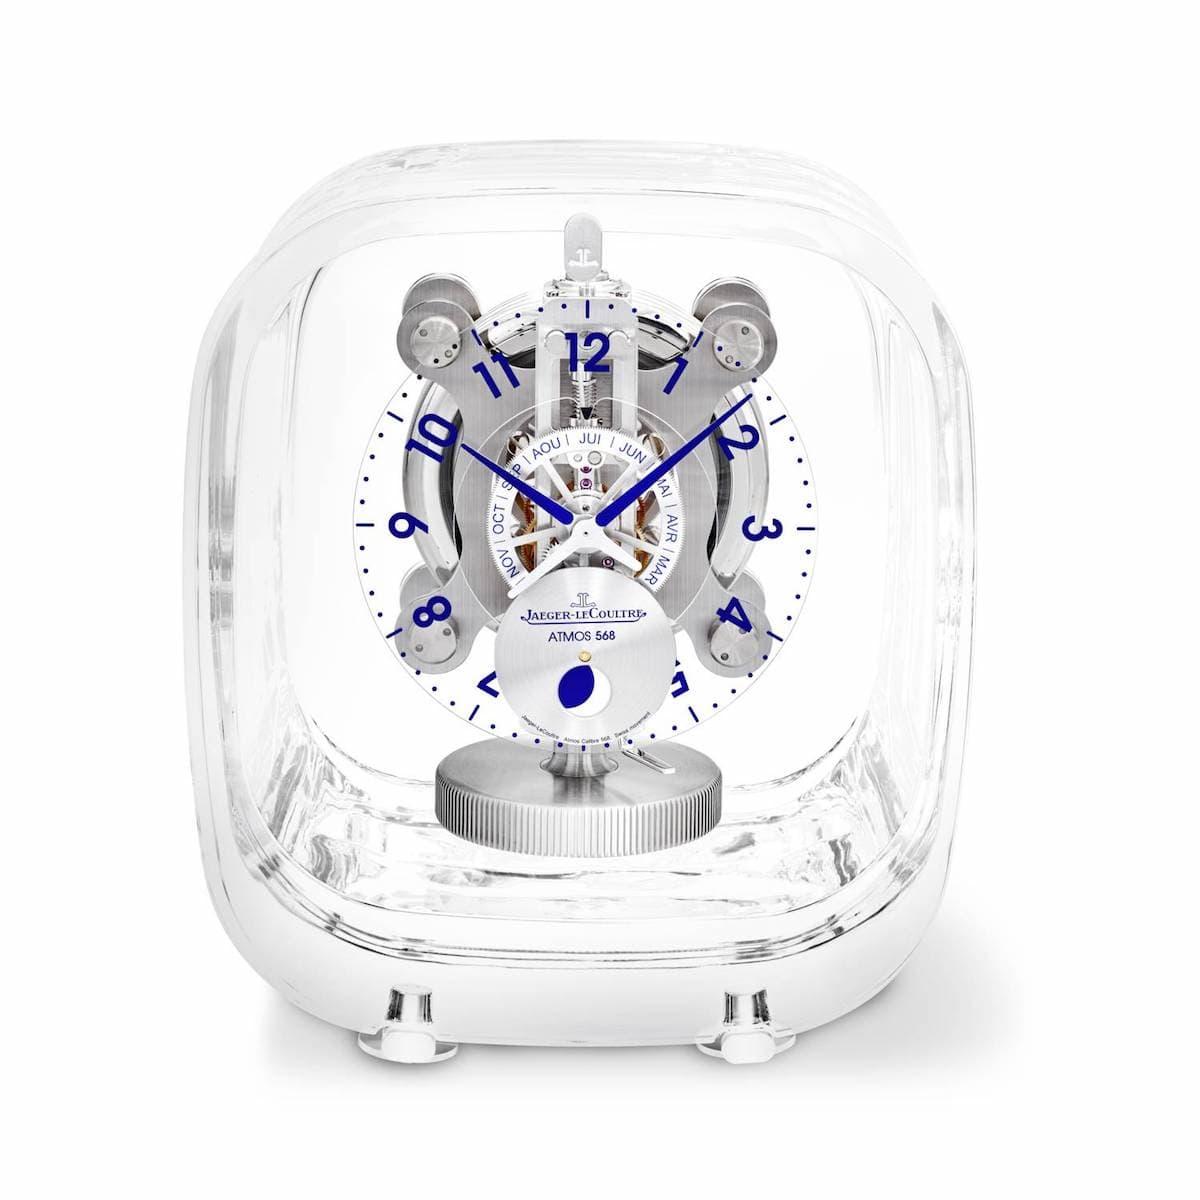 Produkt-8-JLC-Atmos-568-by-Marc-Newson-Ref.-5165107-Preis-27.400-Kopie